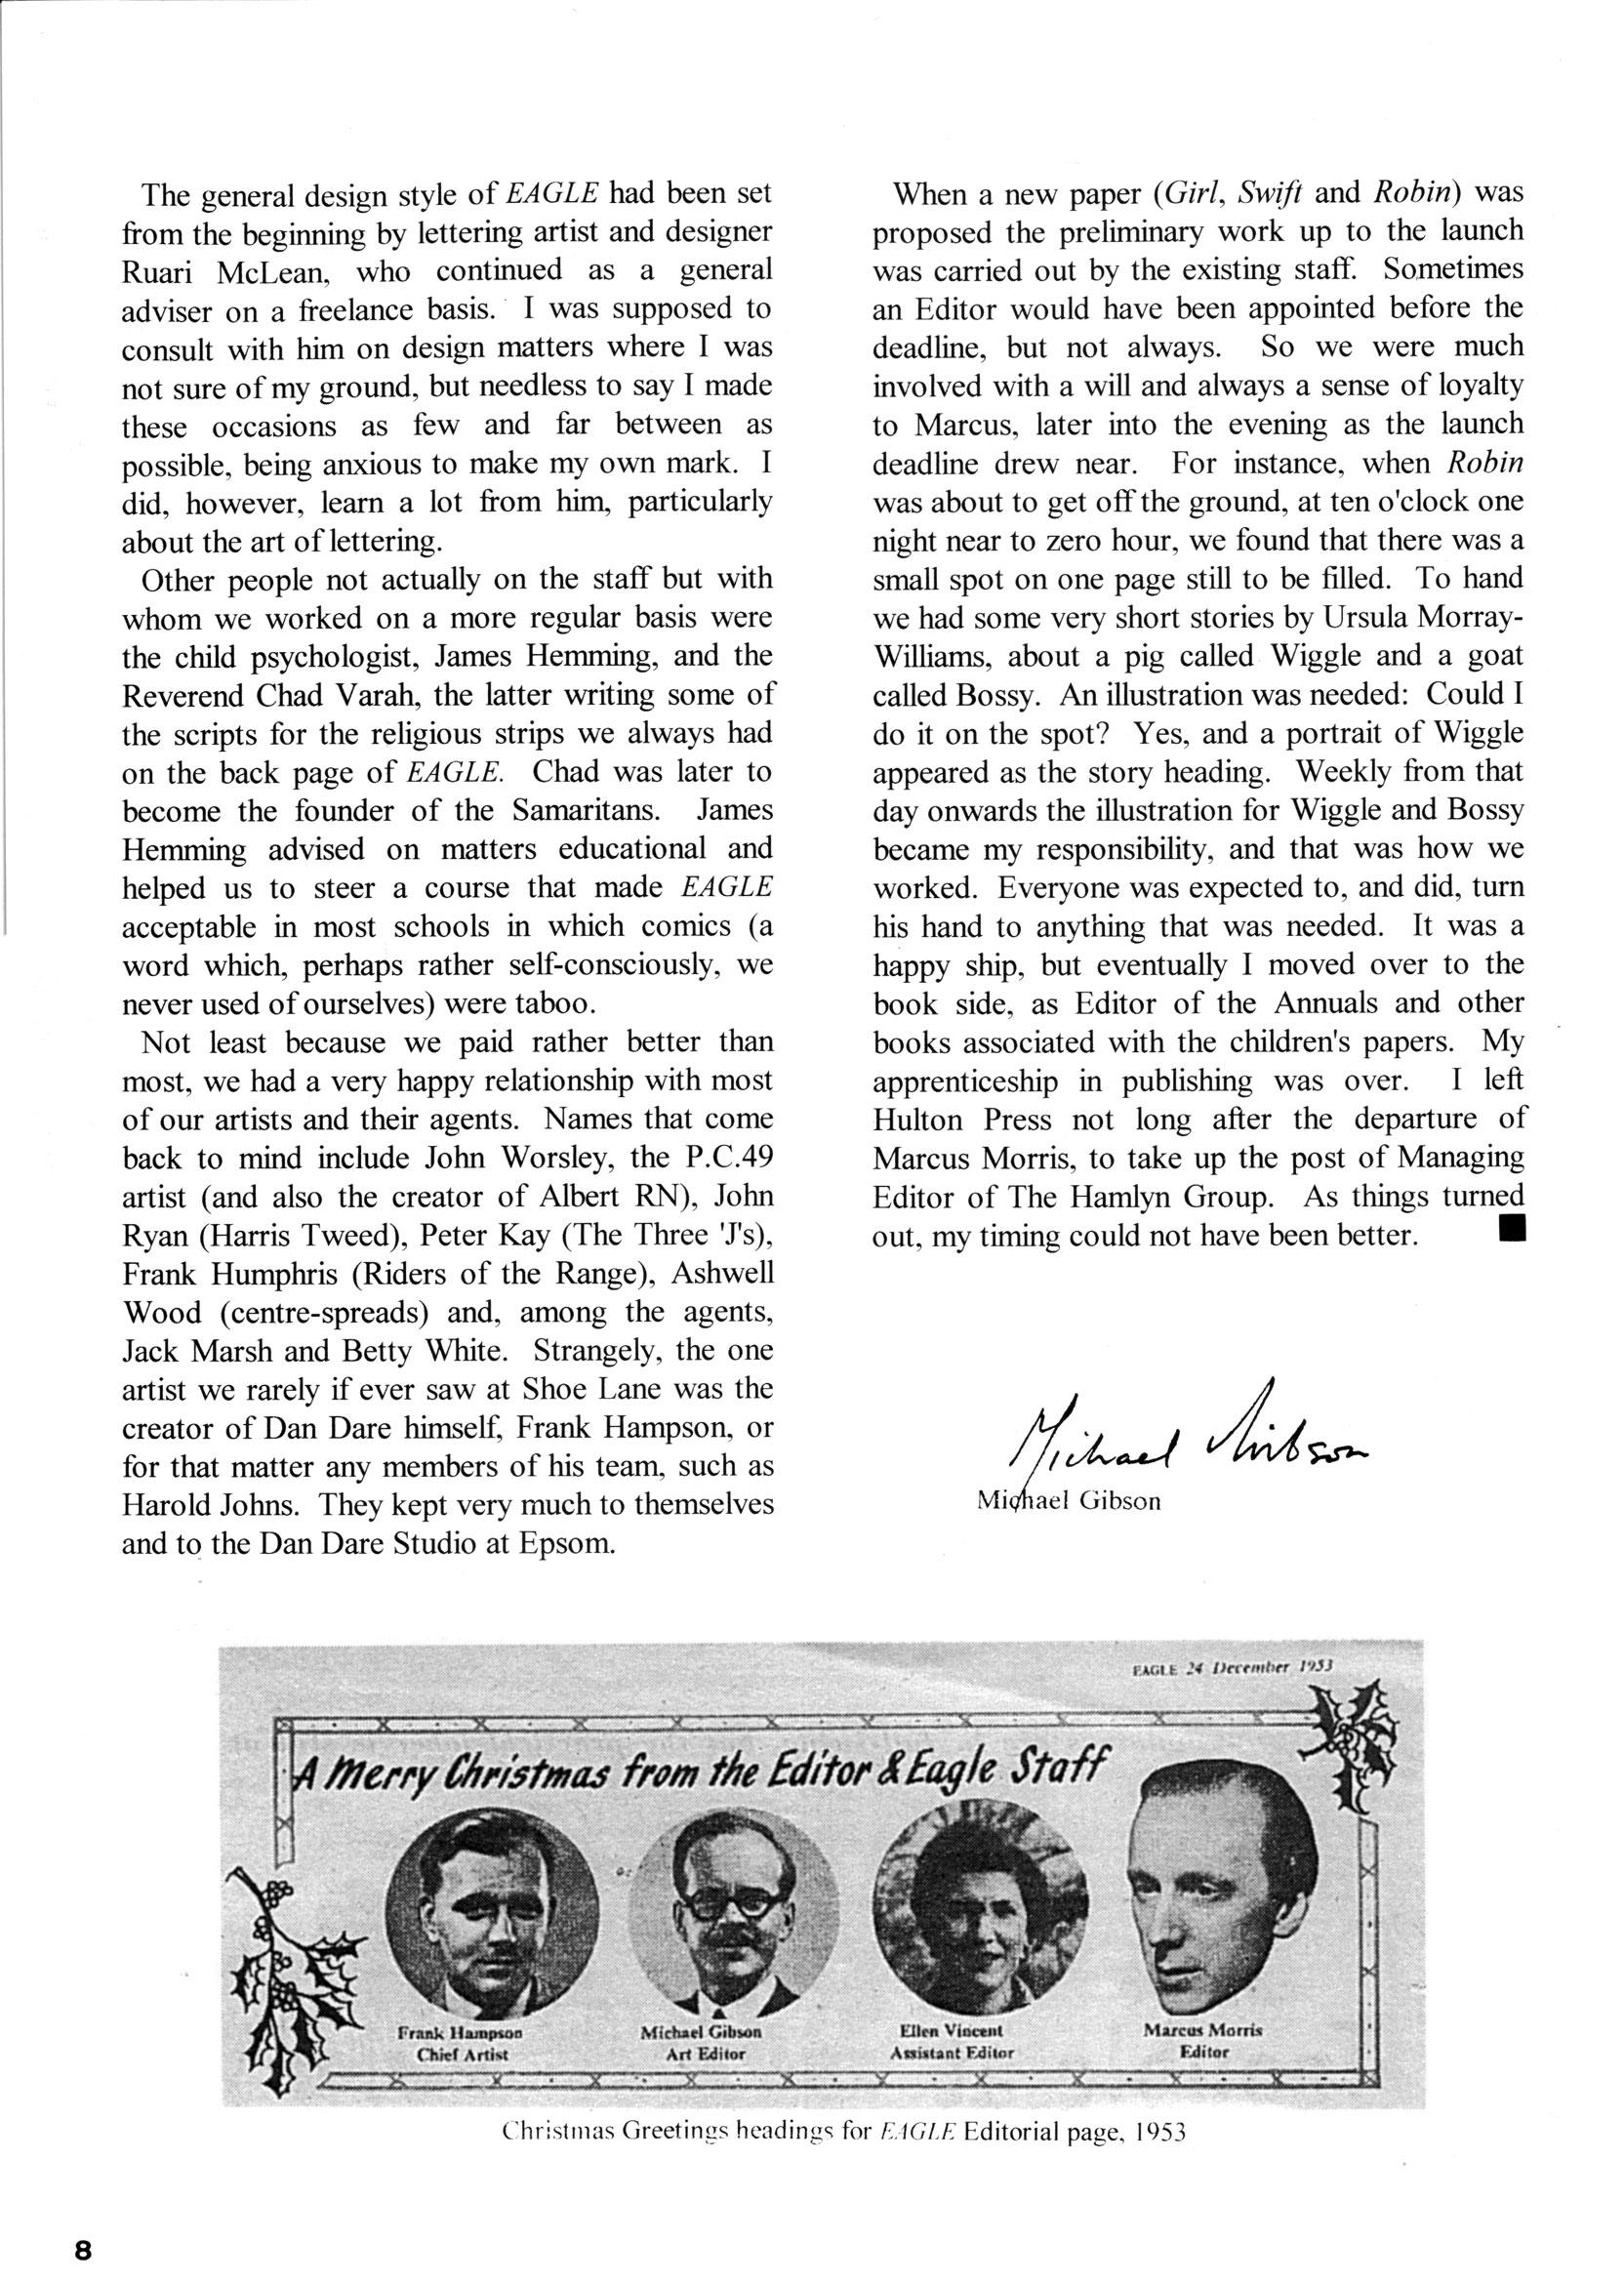 Eagle art editor page 6